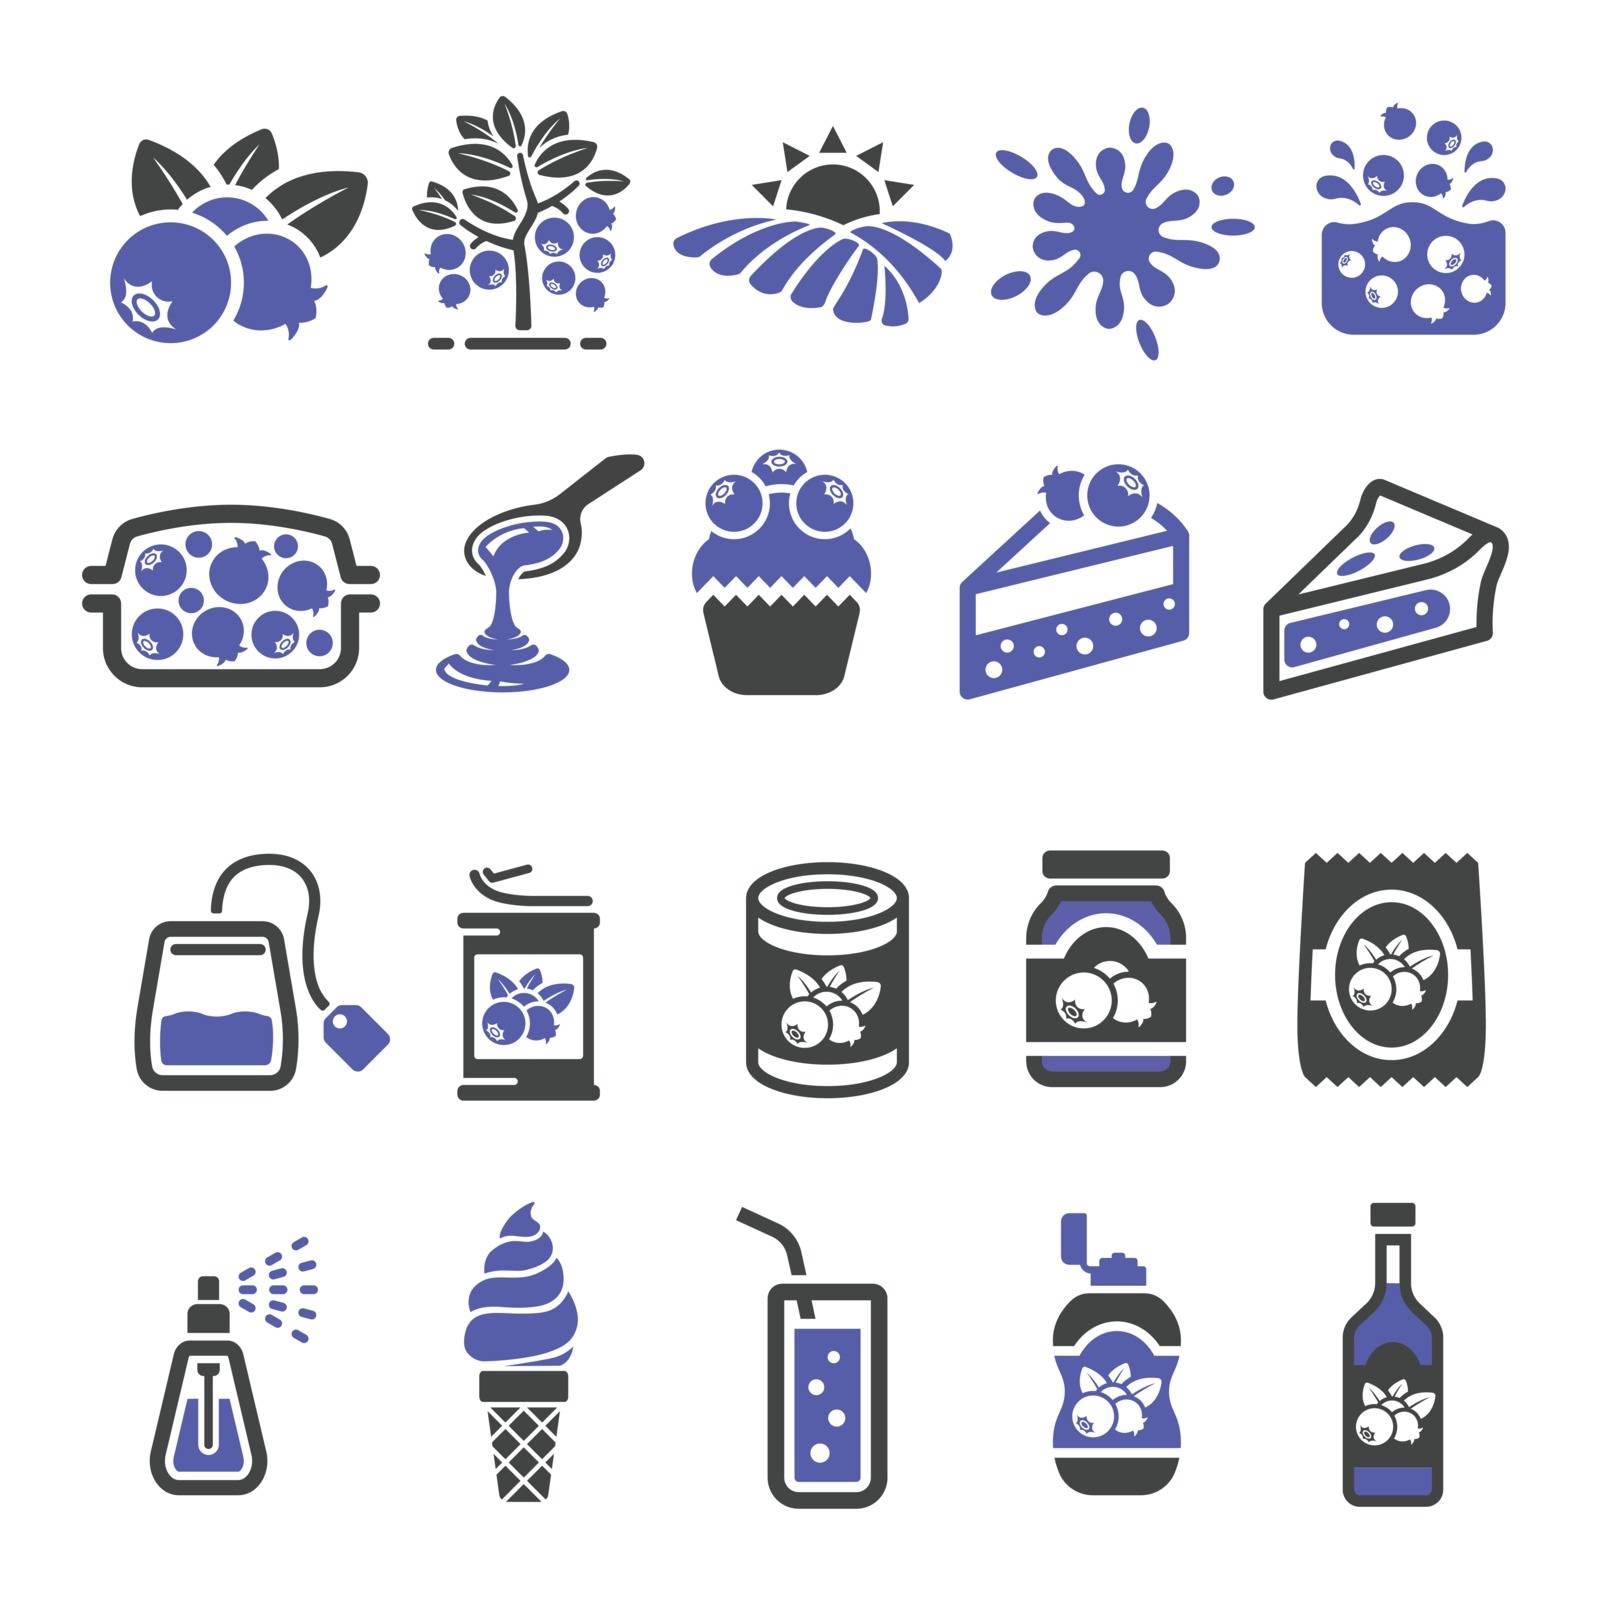 icon,vector,illustration